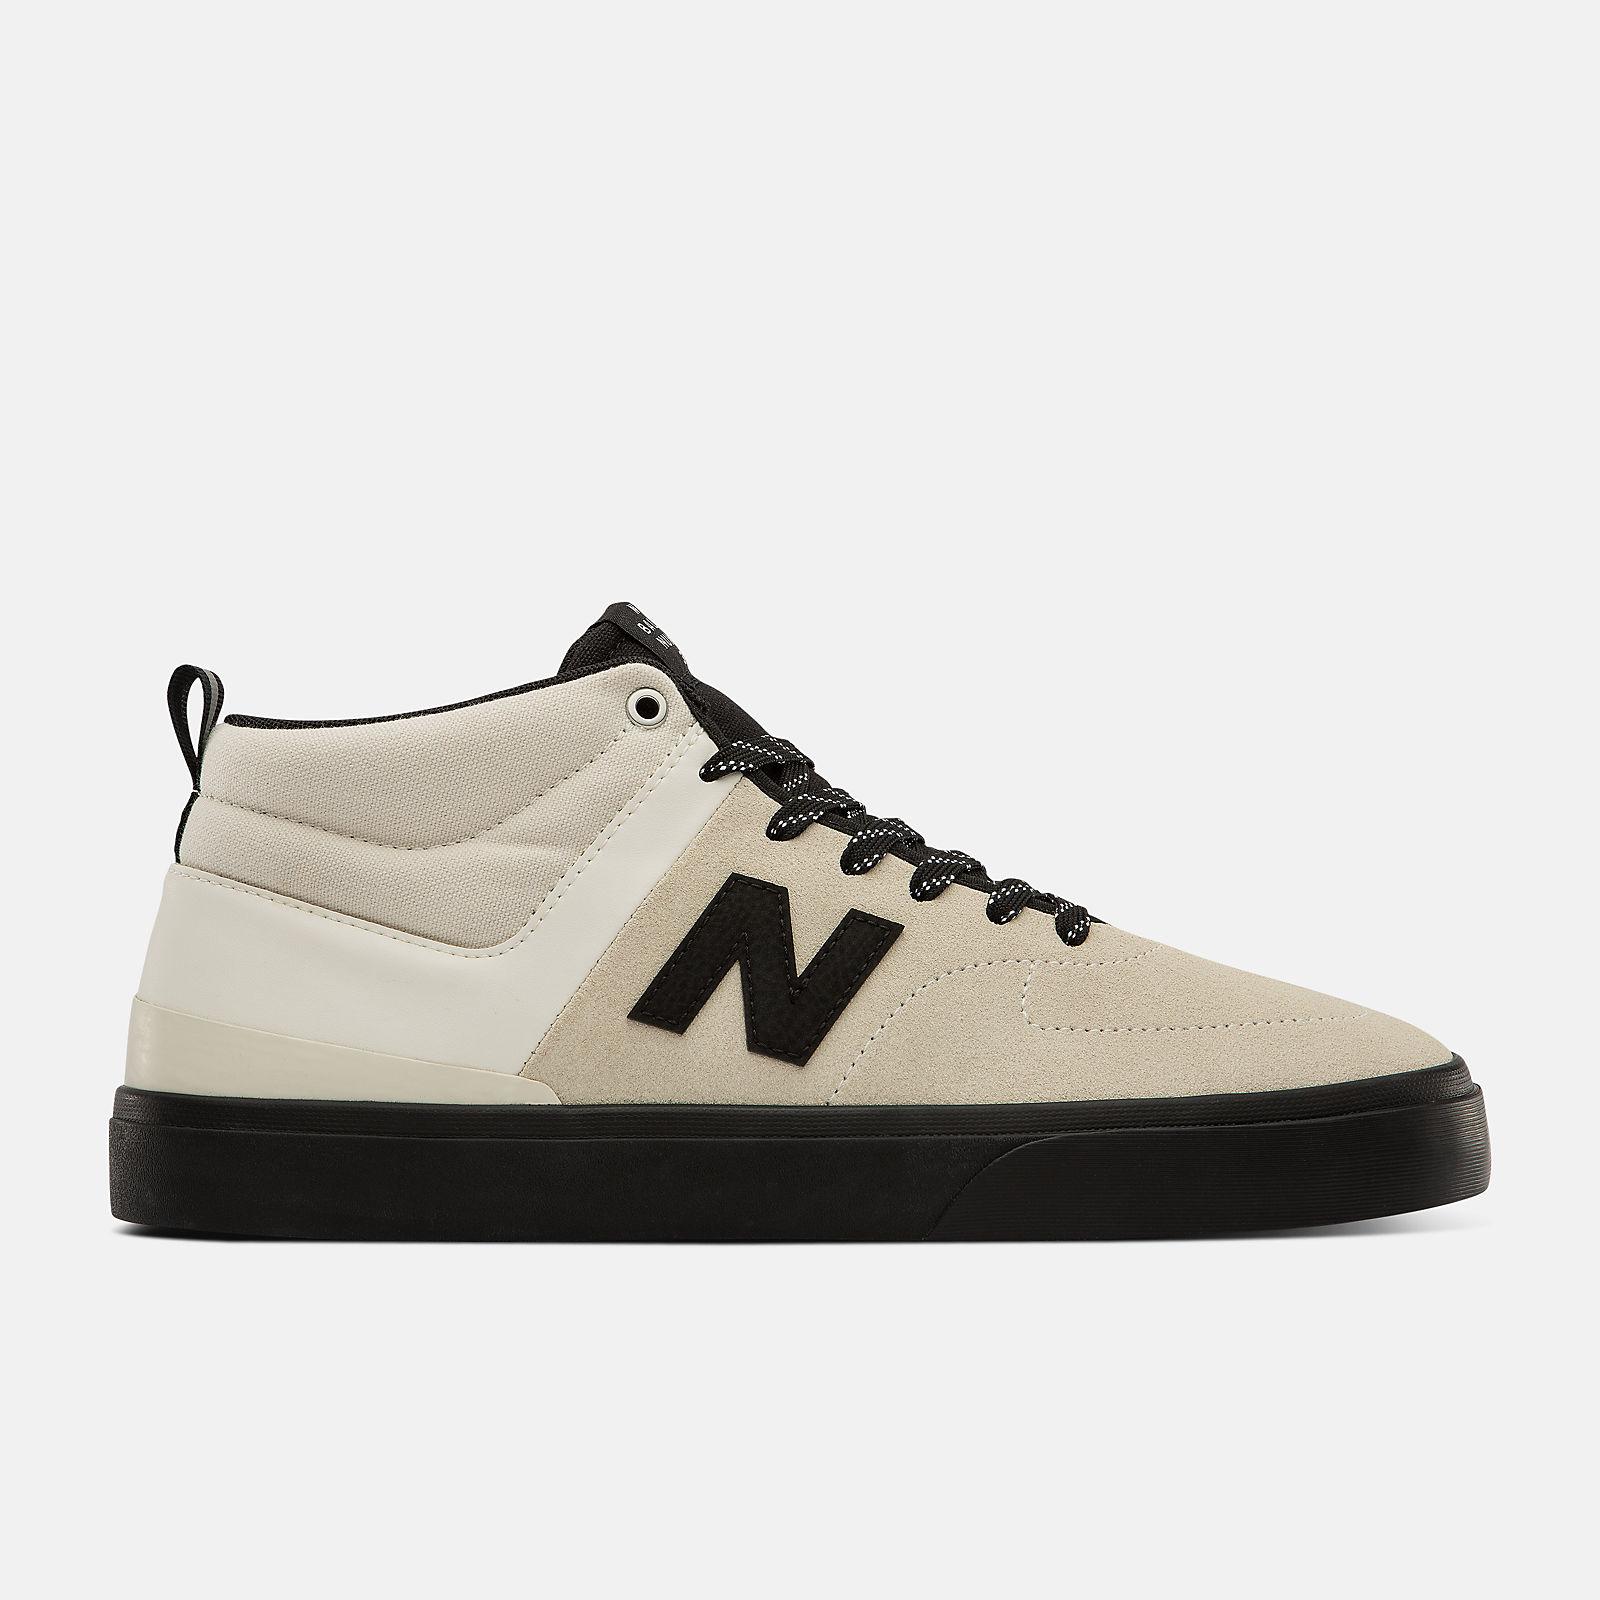 Numeric 379 Mid - New Balance